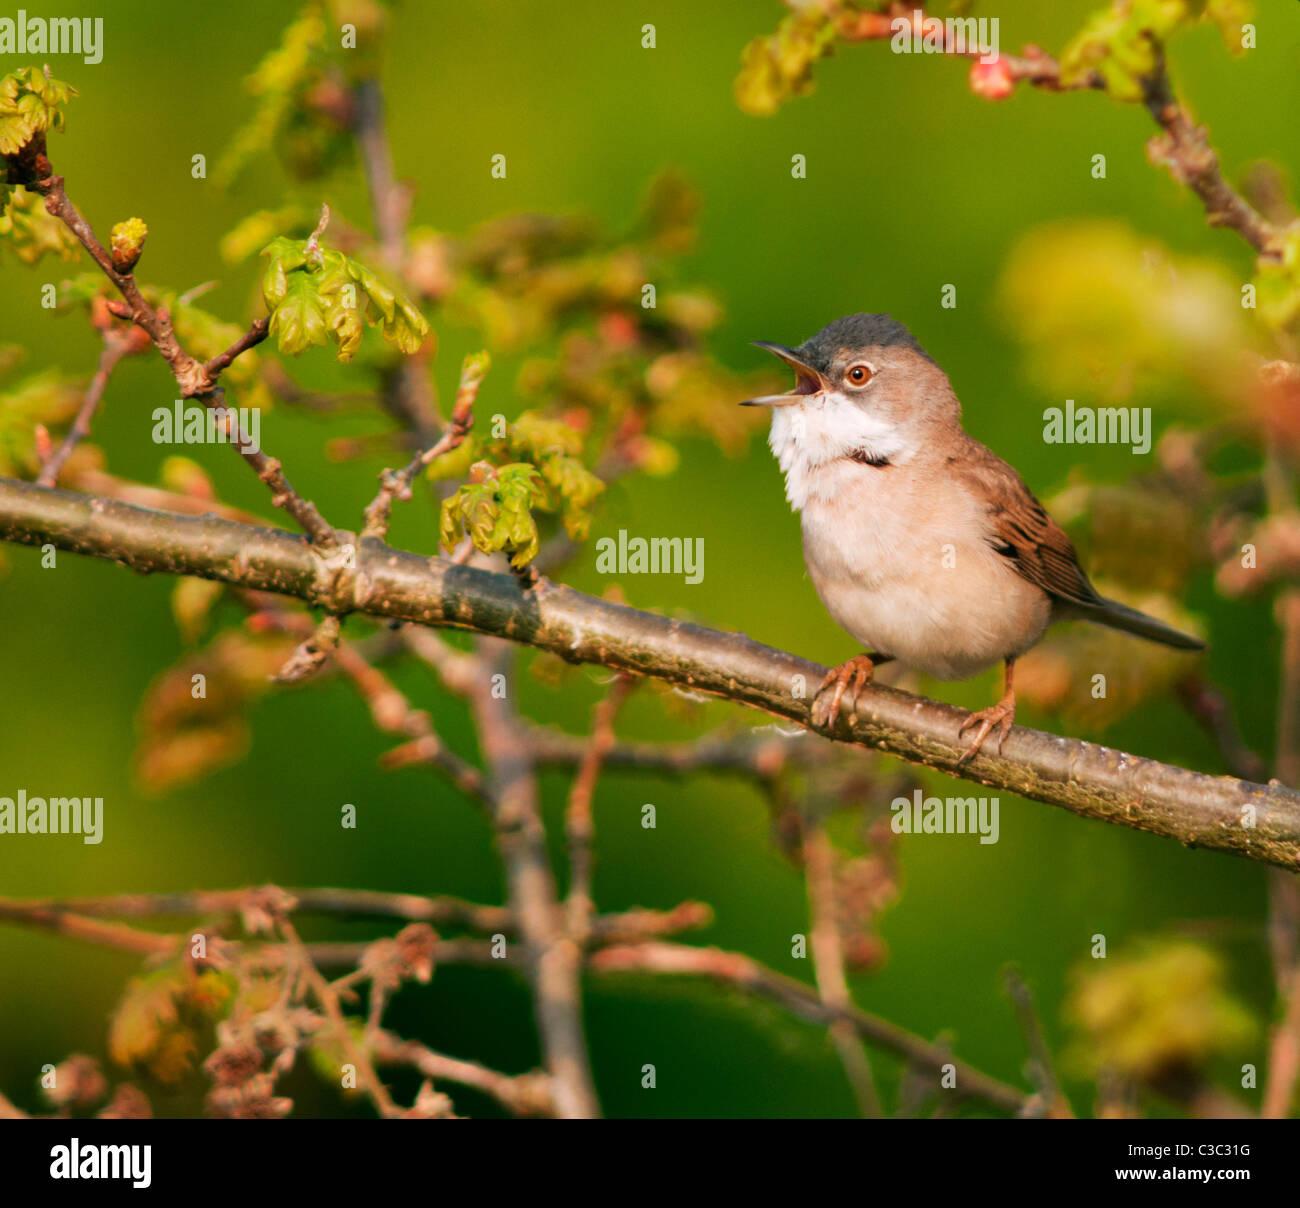 Male Whitethroat (Sylvia communis) singing from perch, Warwickshire - Stock Image